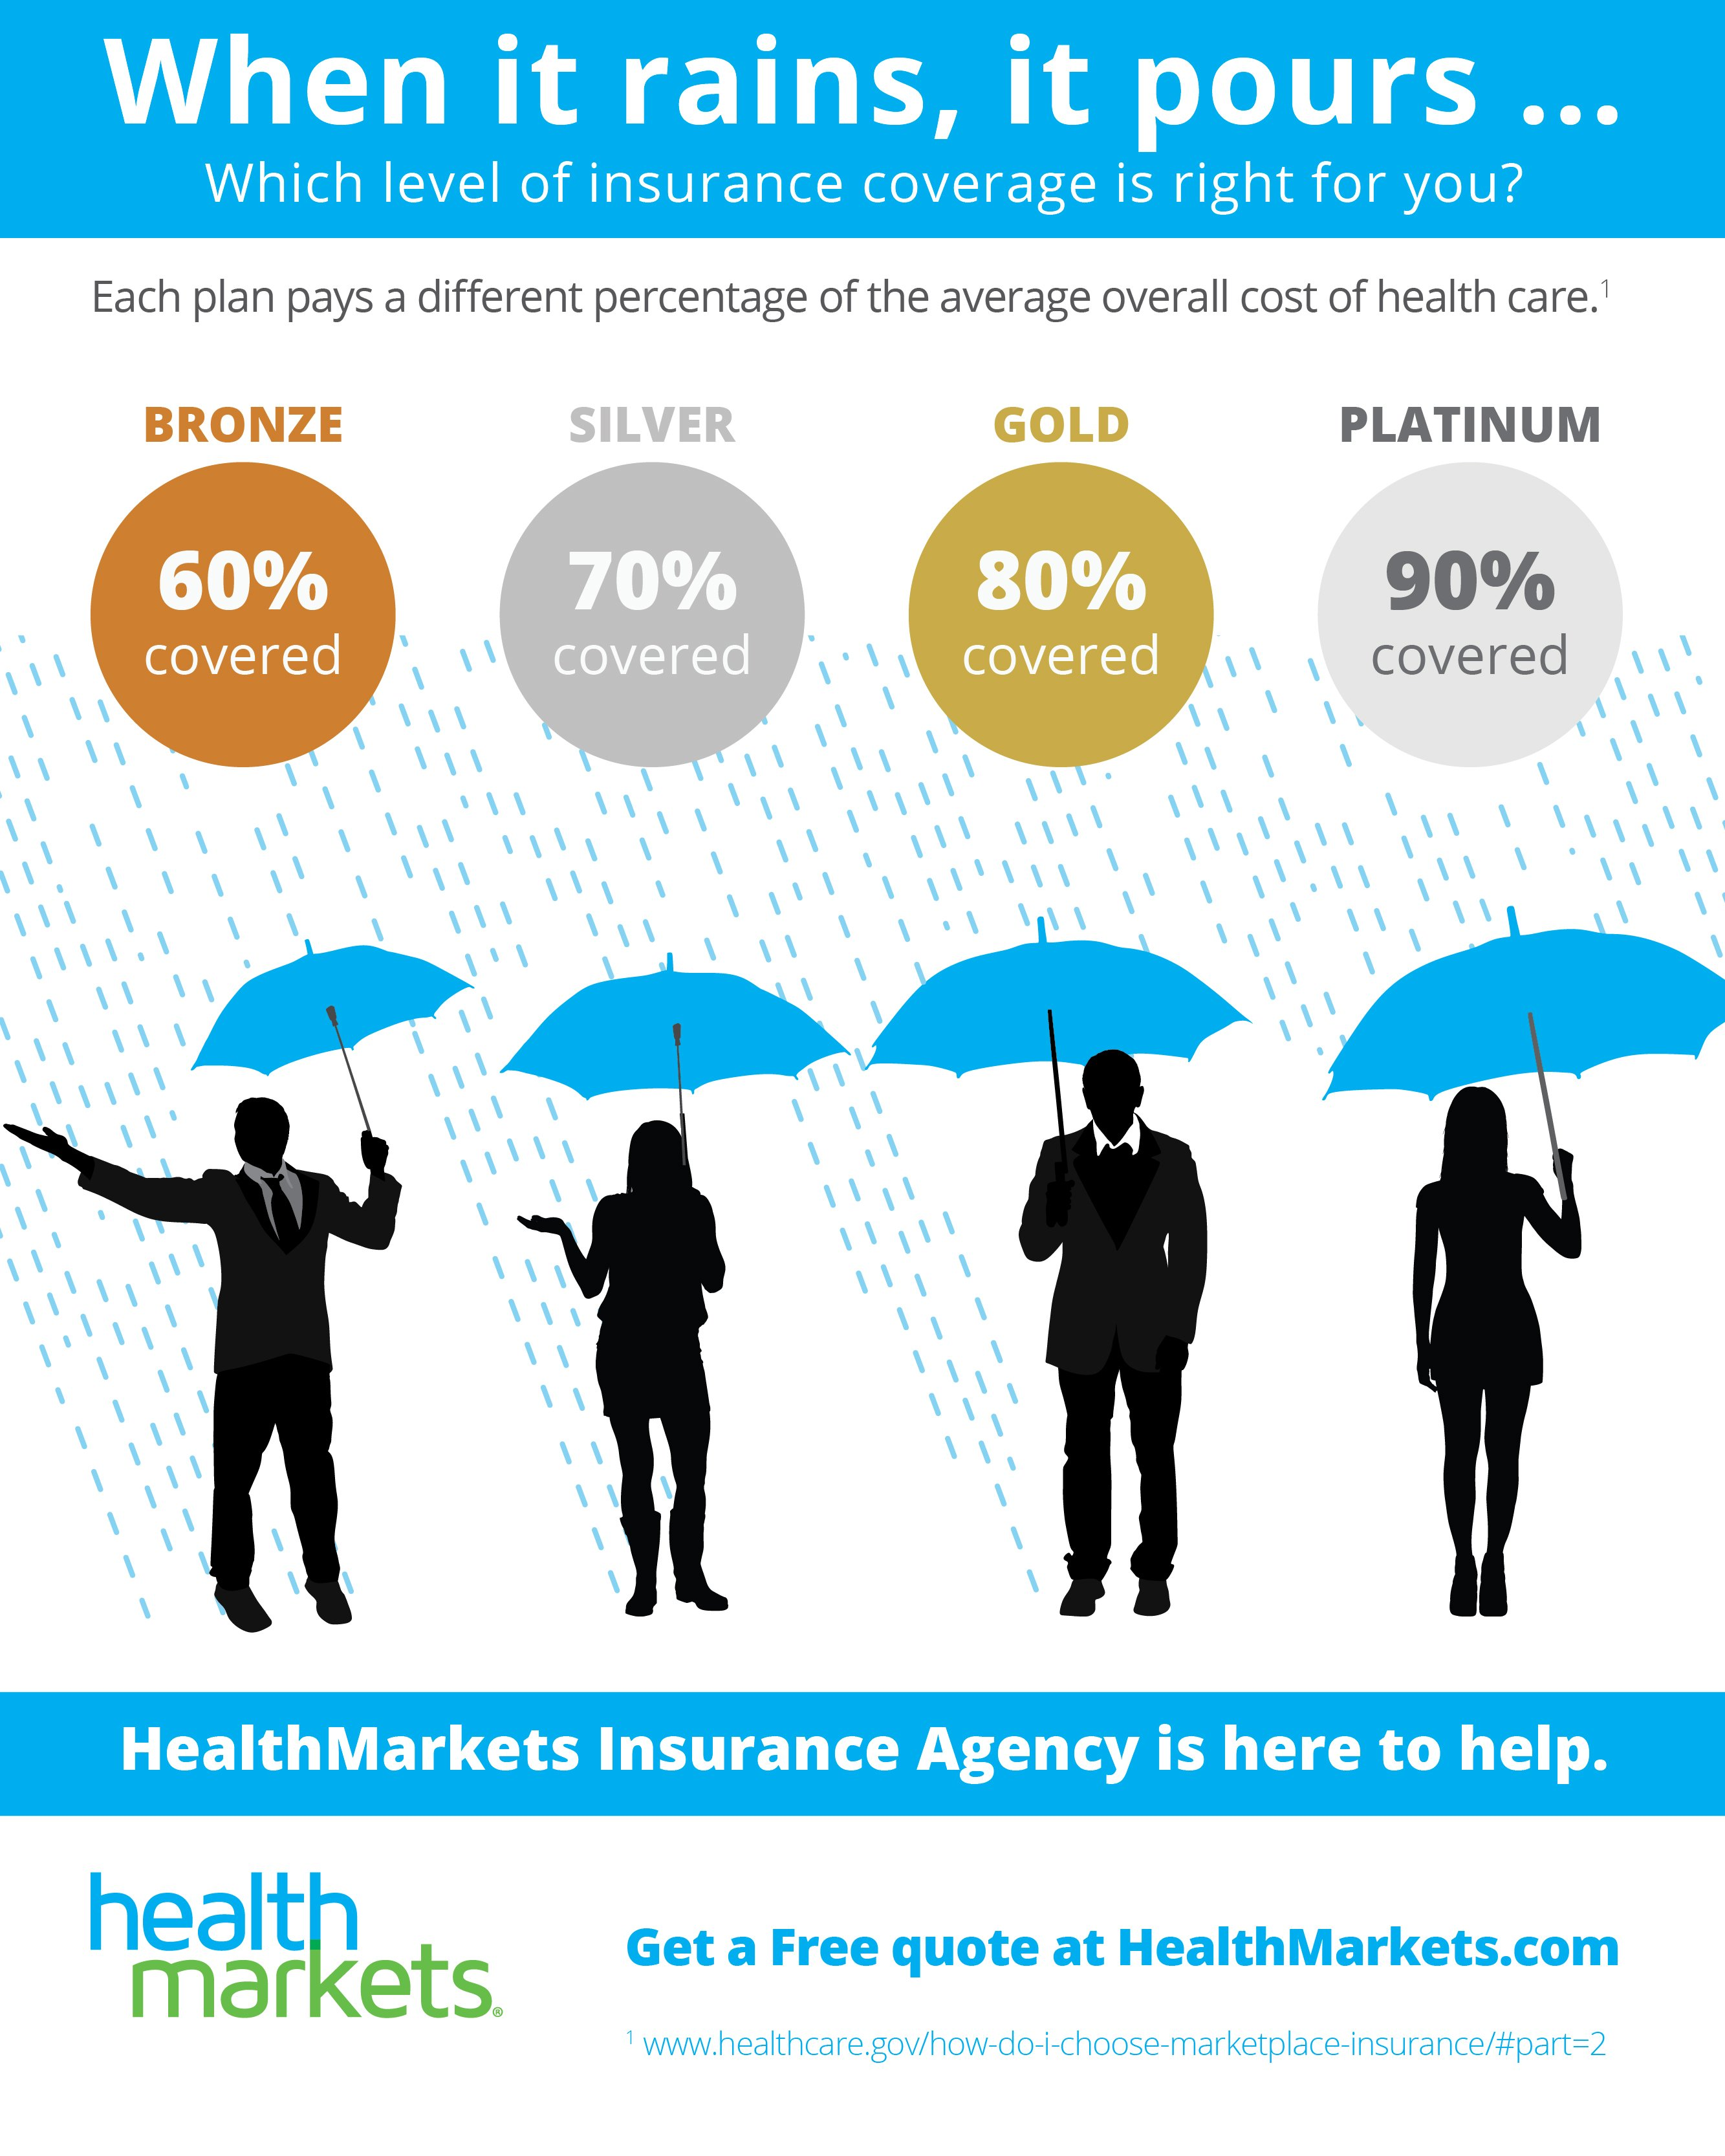 affordable health insurance ga metal levels bronze silver gold platinum